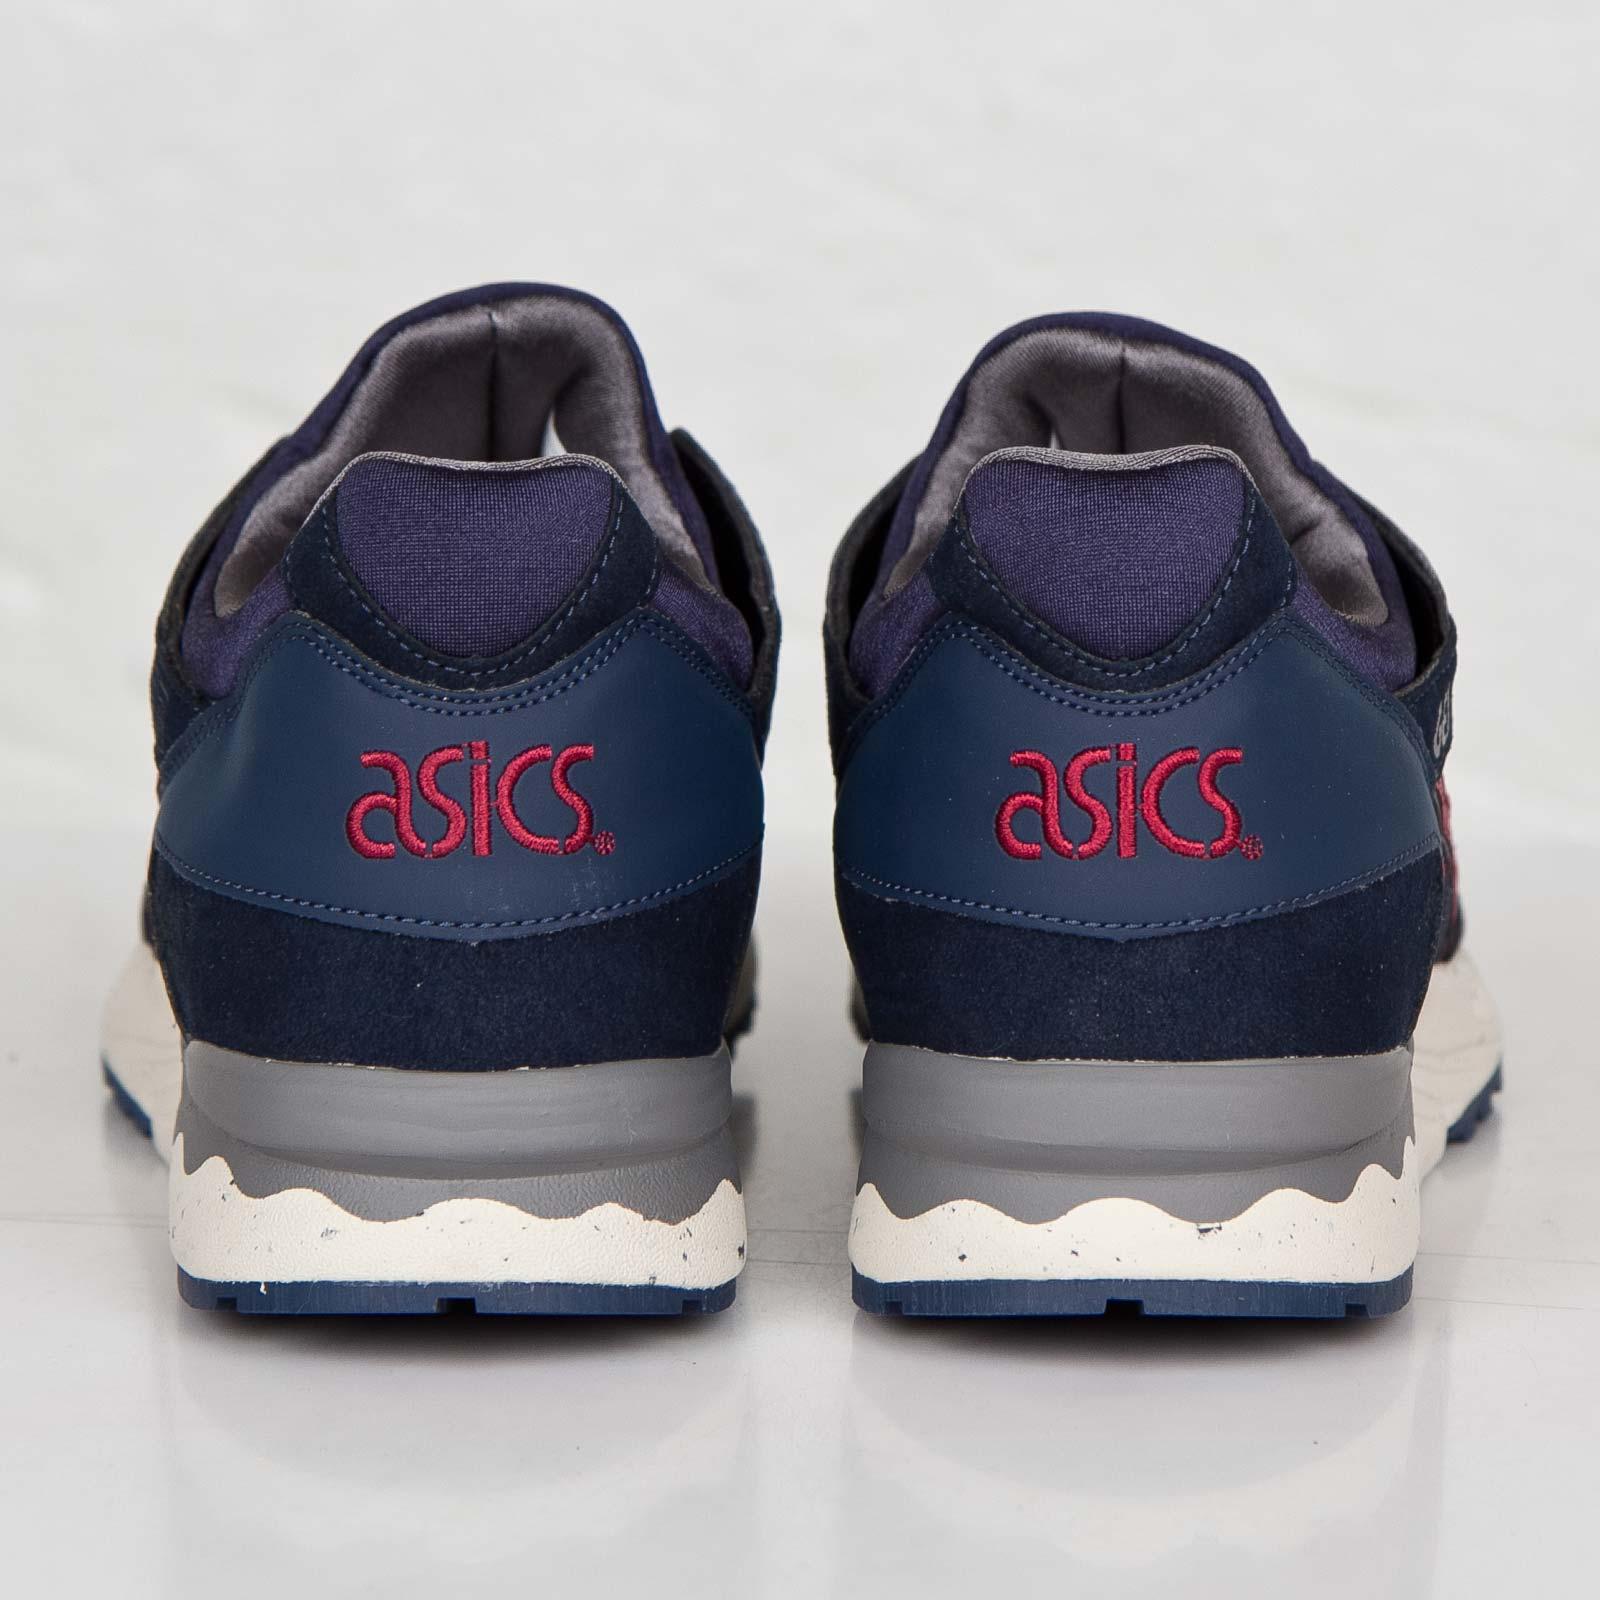 newest 02830 7a0d5 ASICS Tiger Gel-Lyte V - H5d0y-5025 - Sneakersnstuff   sneakers    streetwear online since 1999